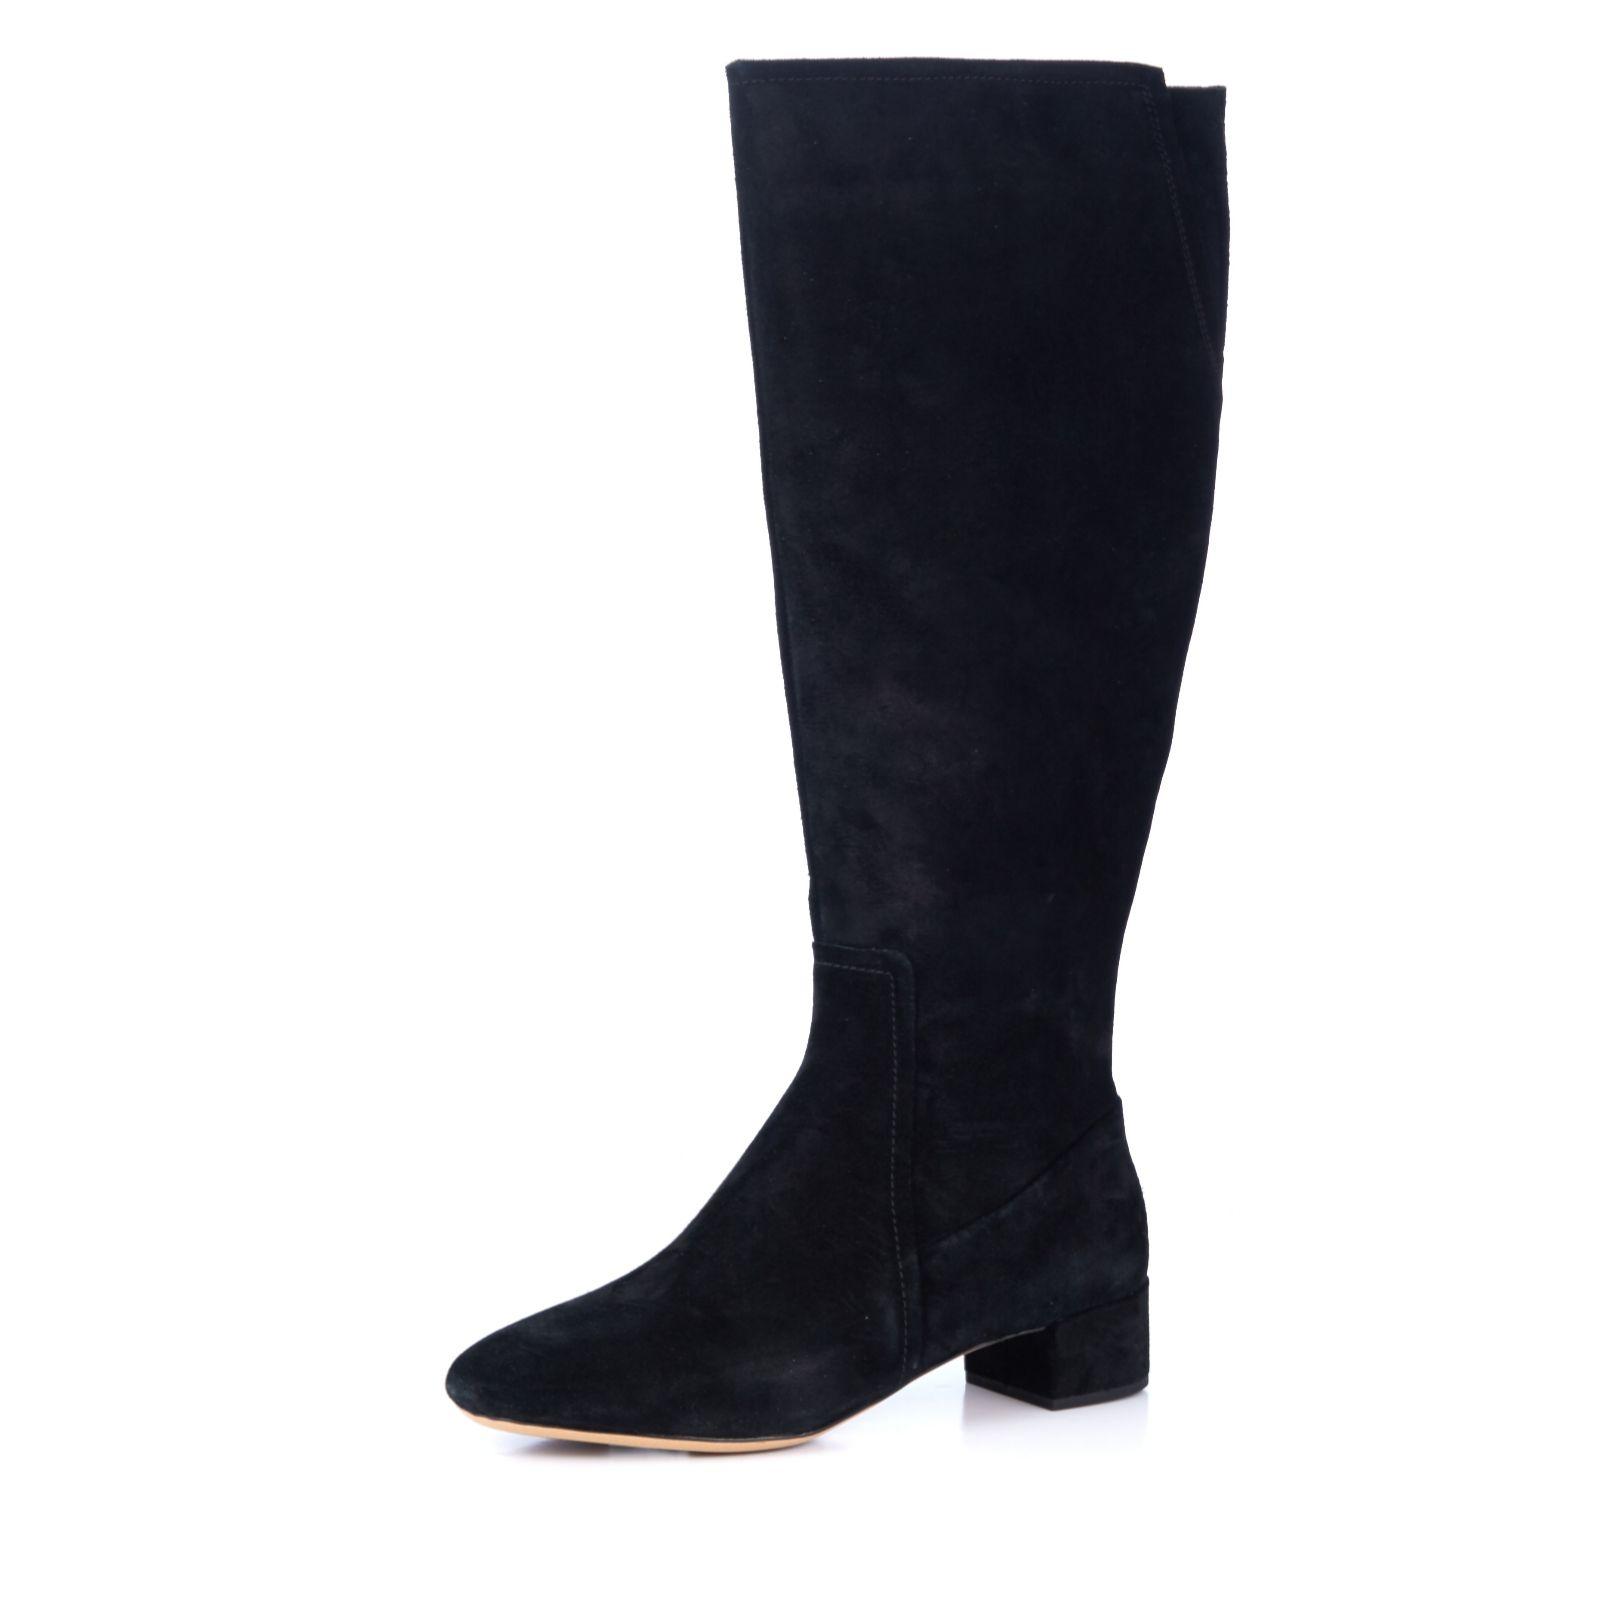 a100610d9a1 Clarks Orabella Ava Block Heel Knee High Boot - QVC UK